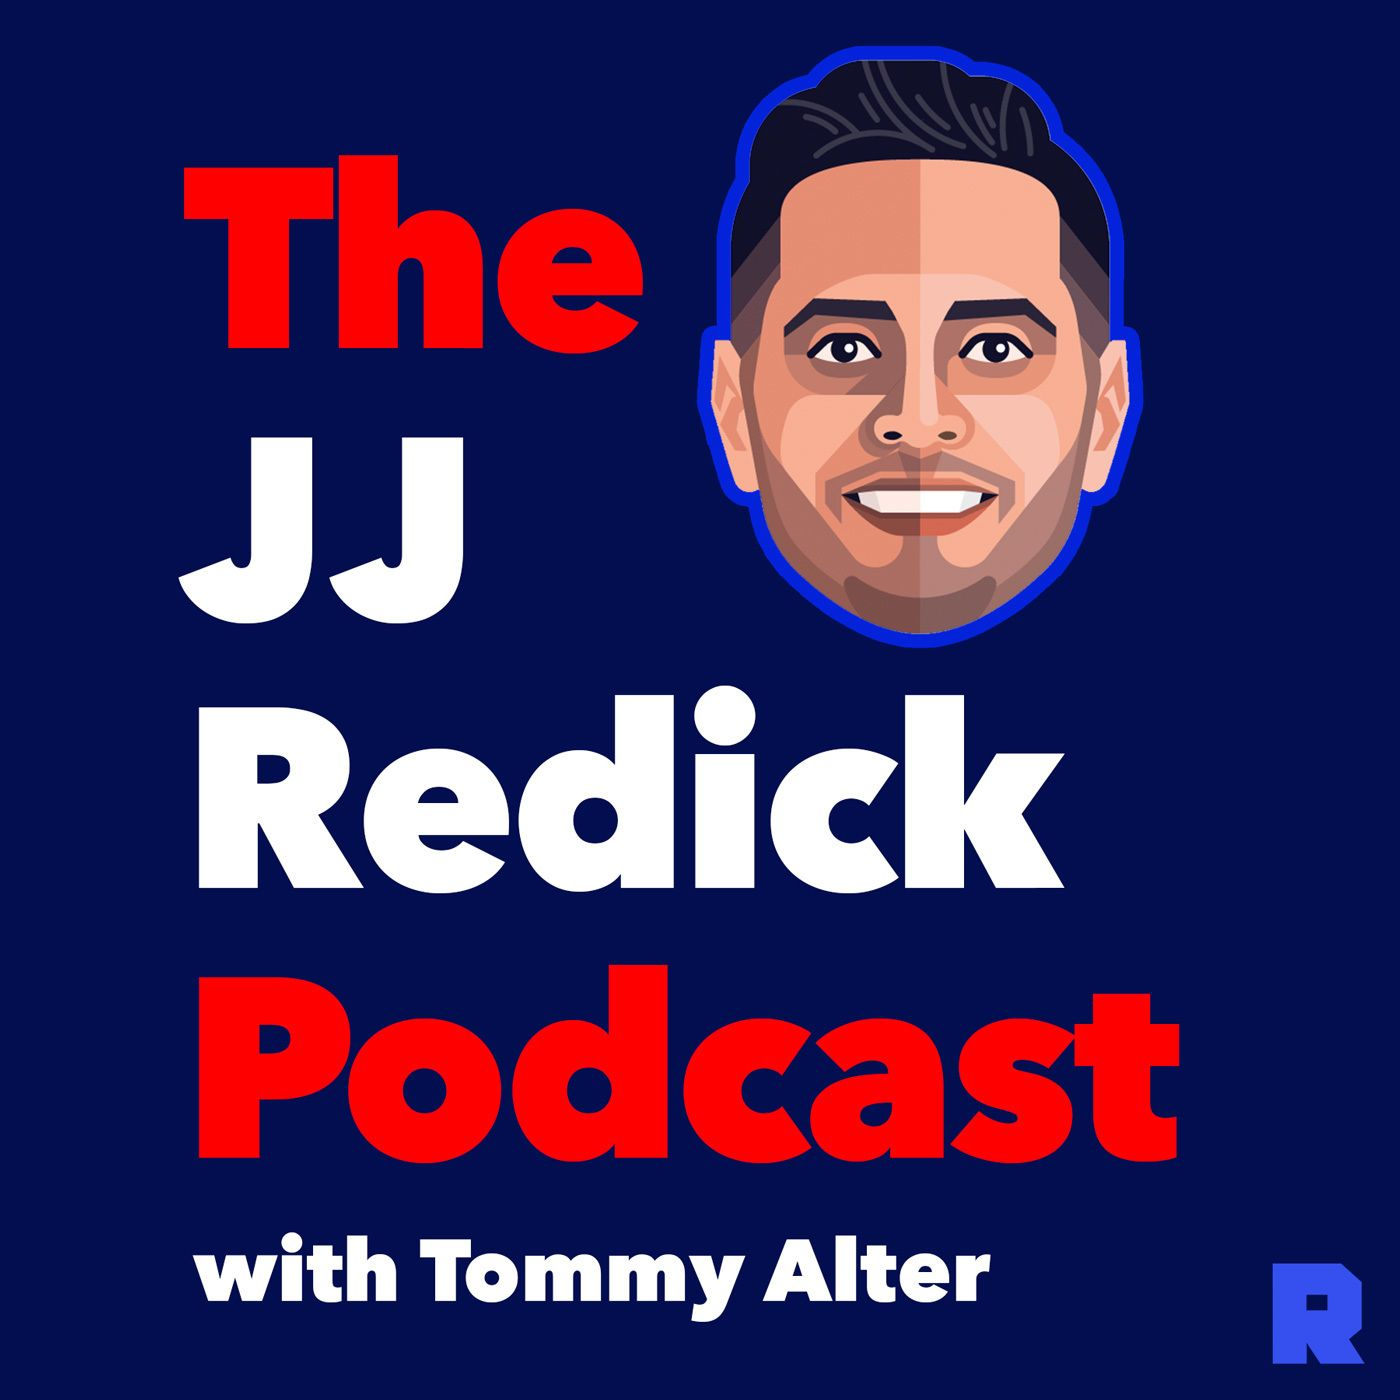 #42 - The JJ Redick Podcast